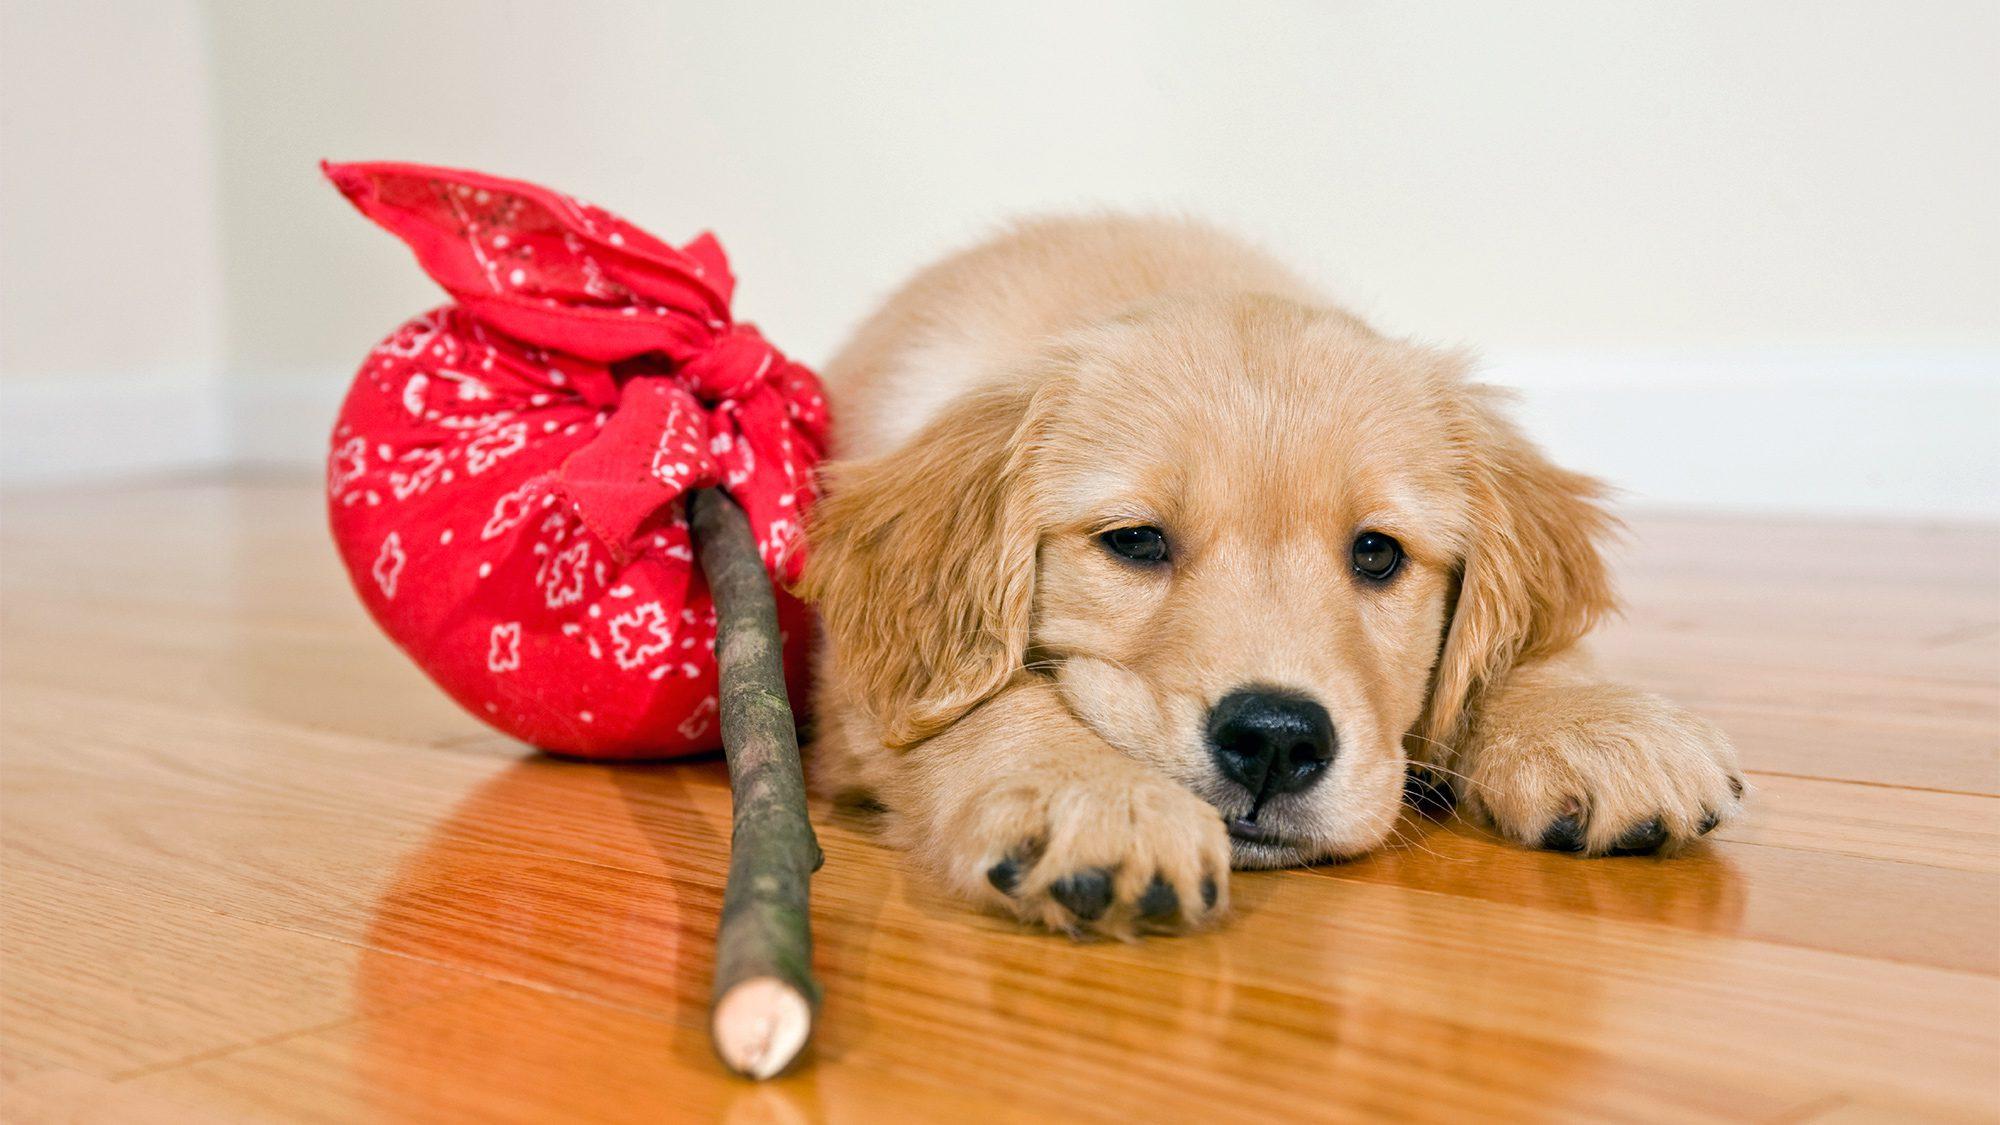 Golden Retriever puppy with hobo bindle